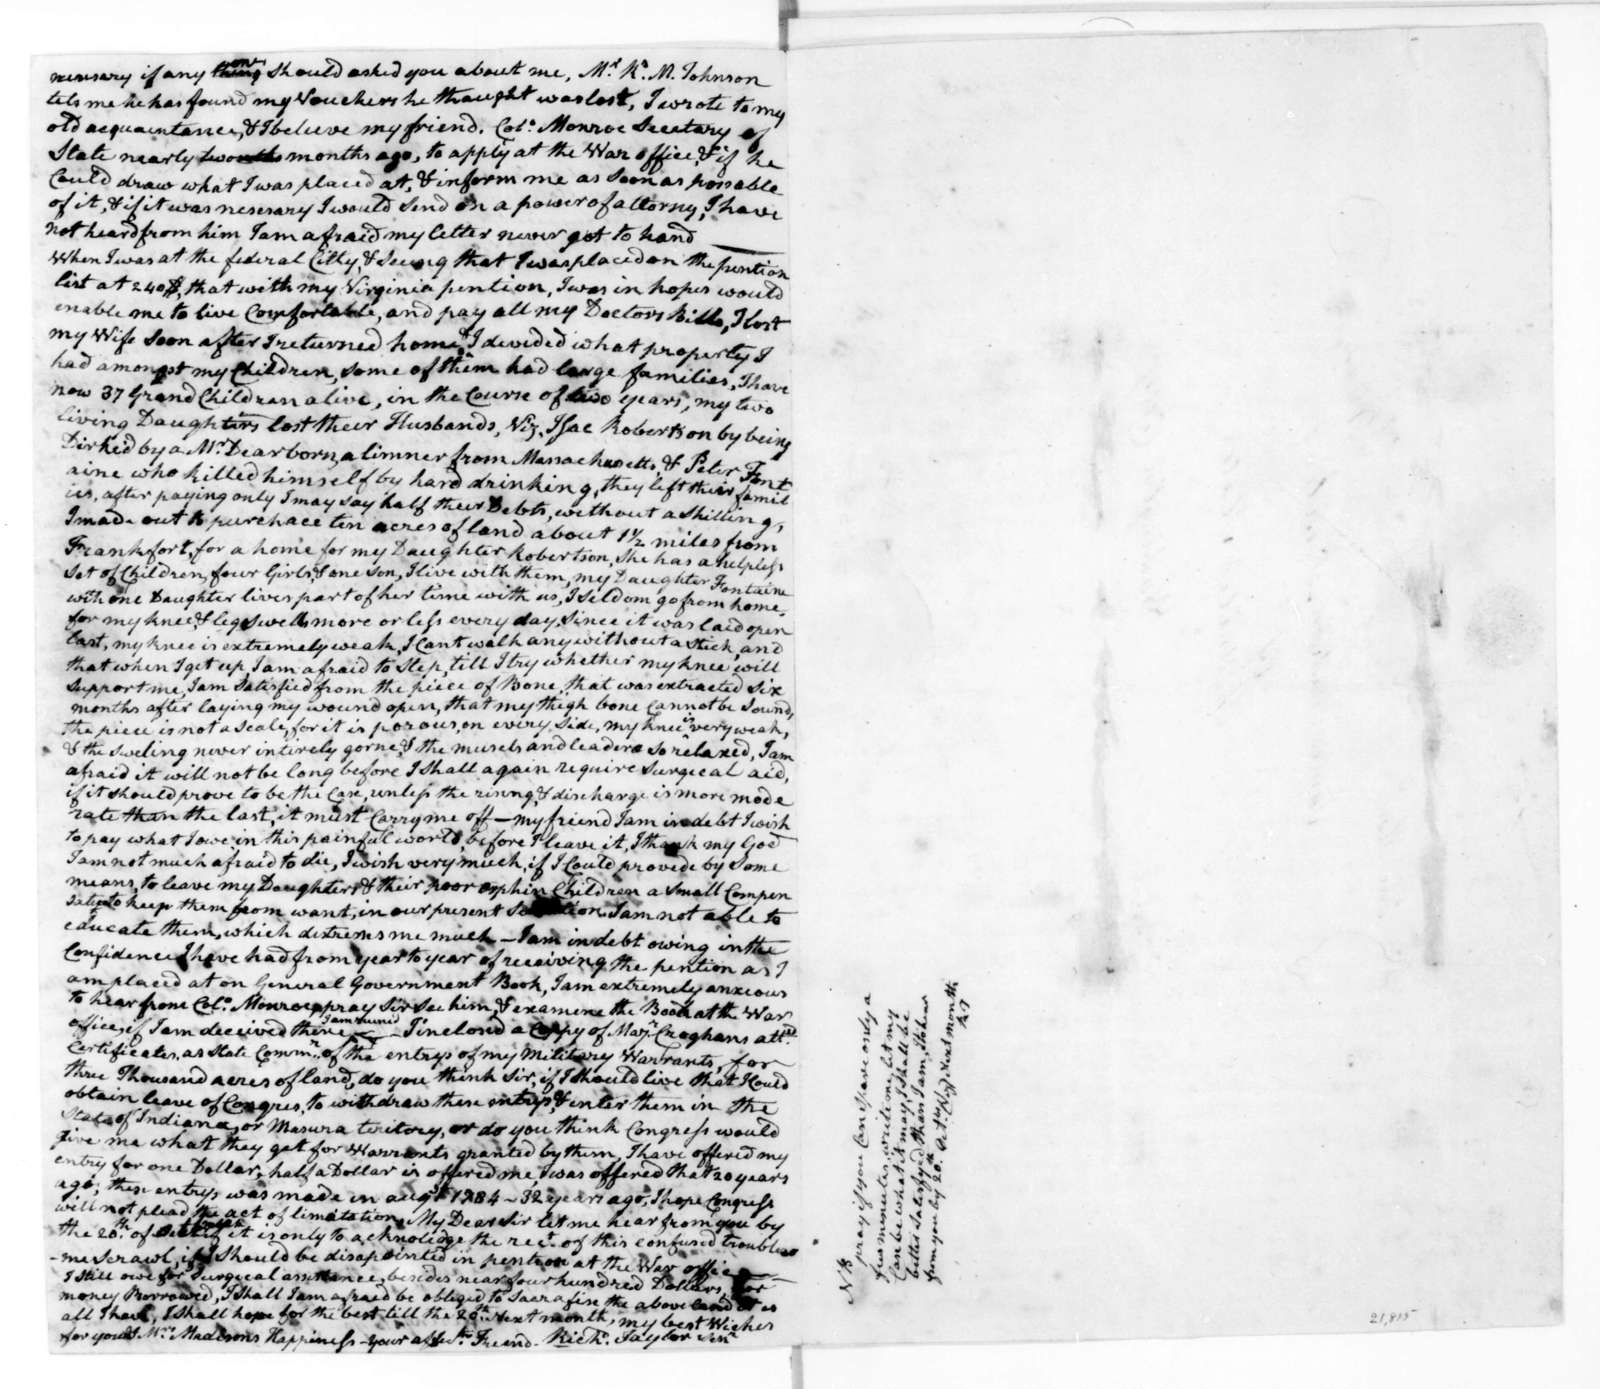 Richard Taylor to James Madison, September 26, 1816.